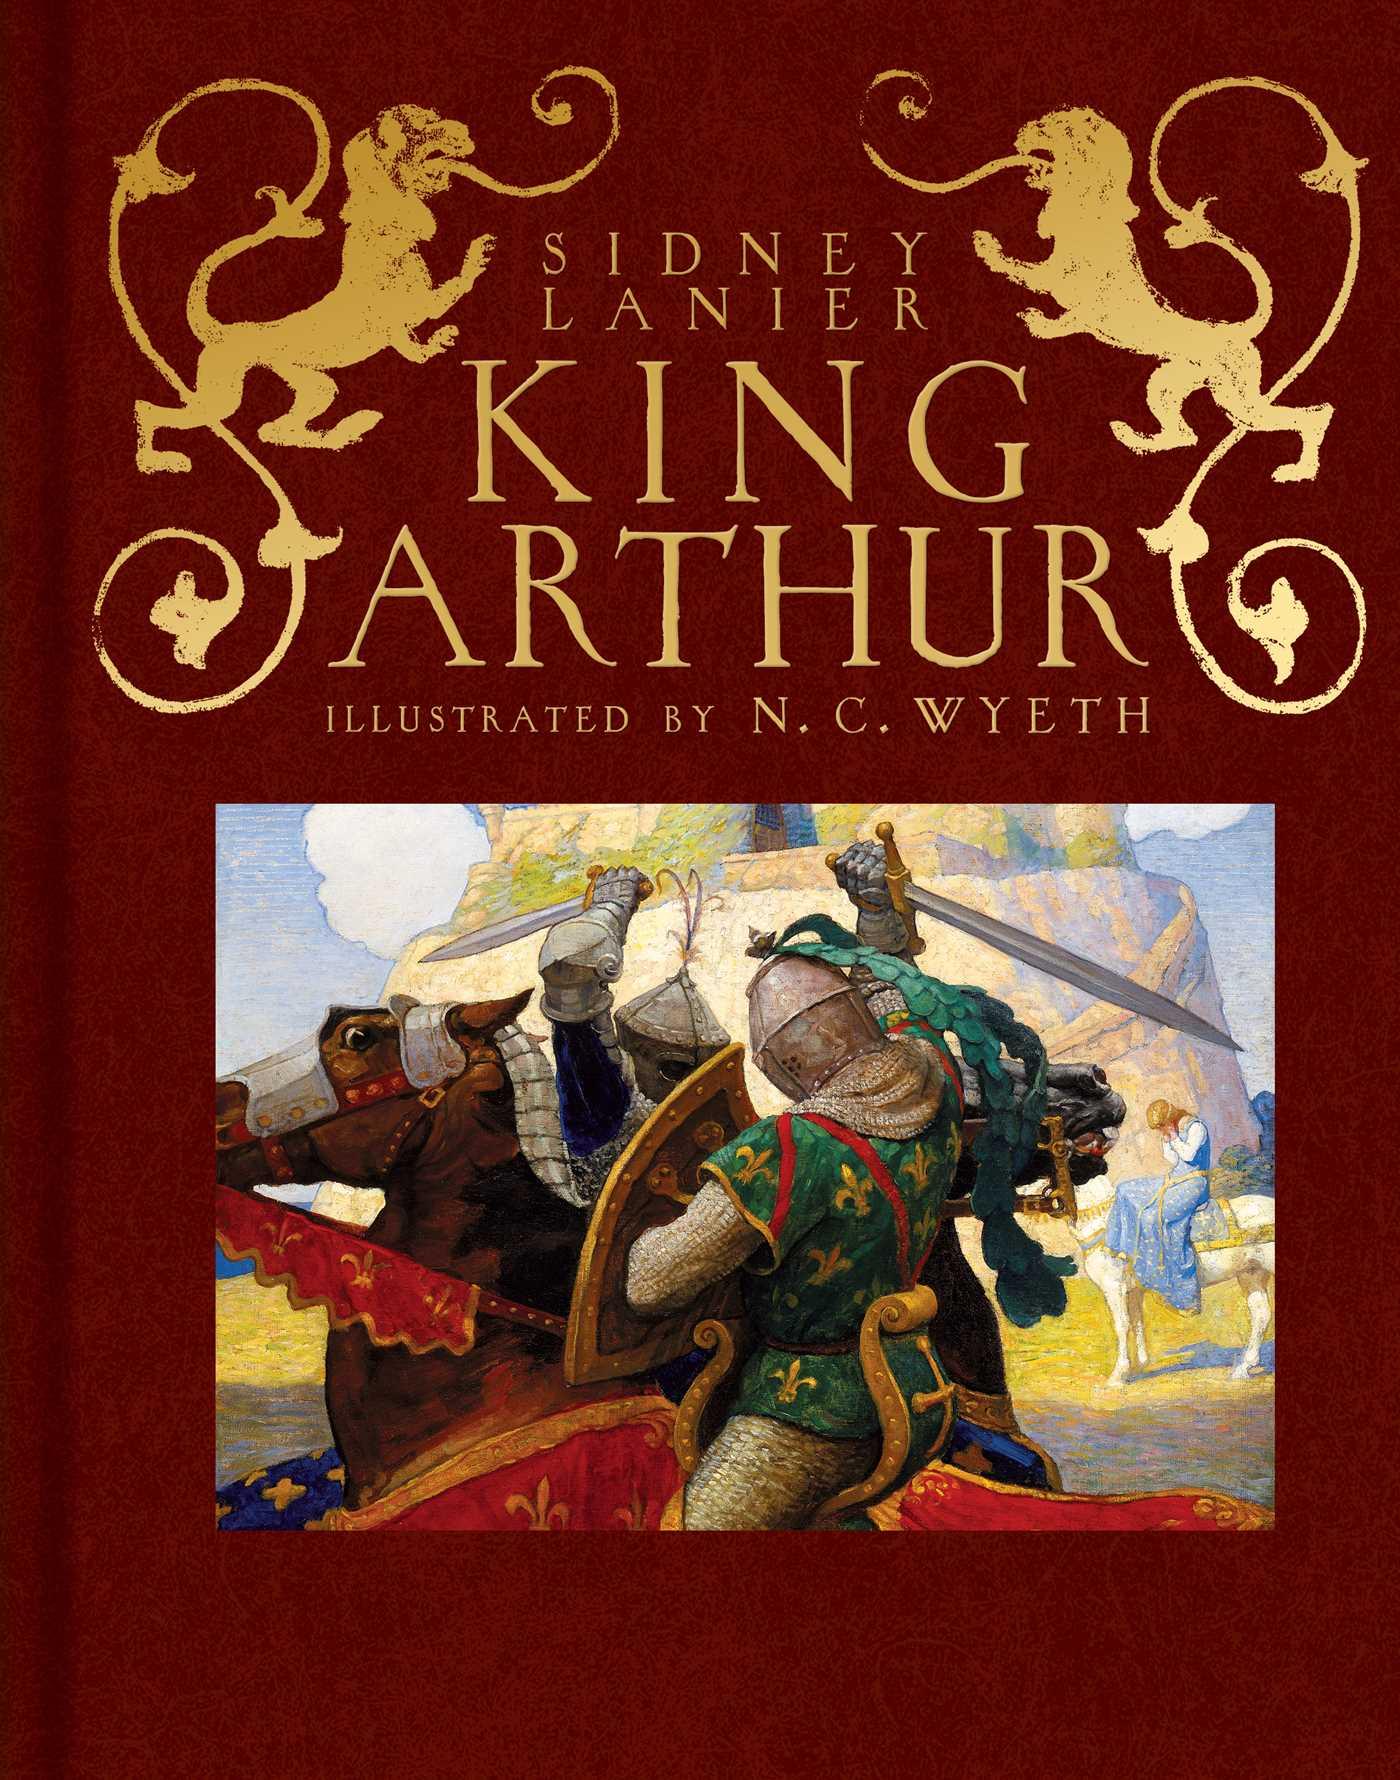 King arthur 9781534428416 hr